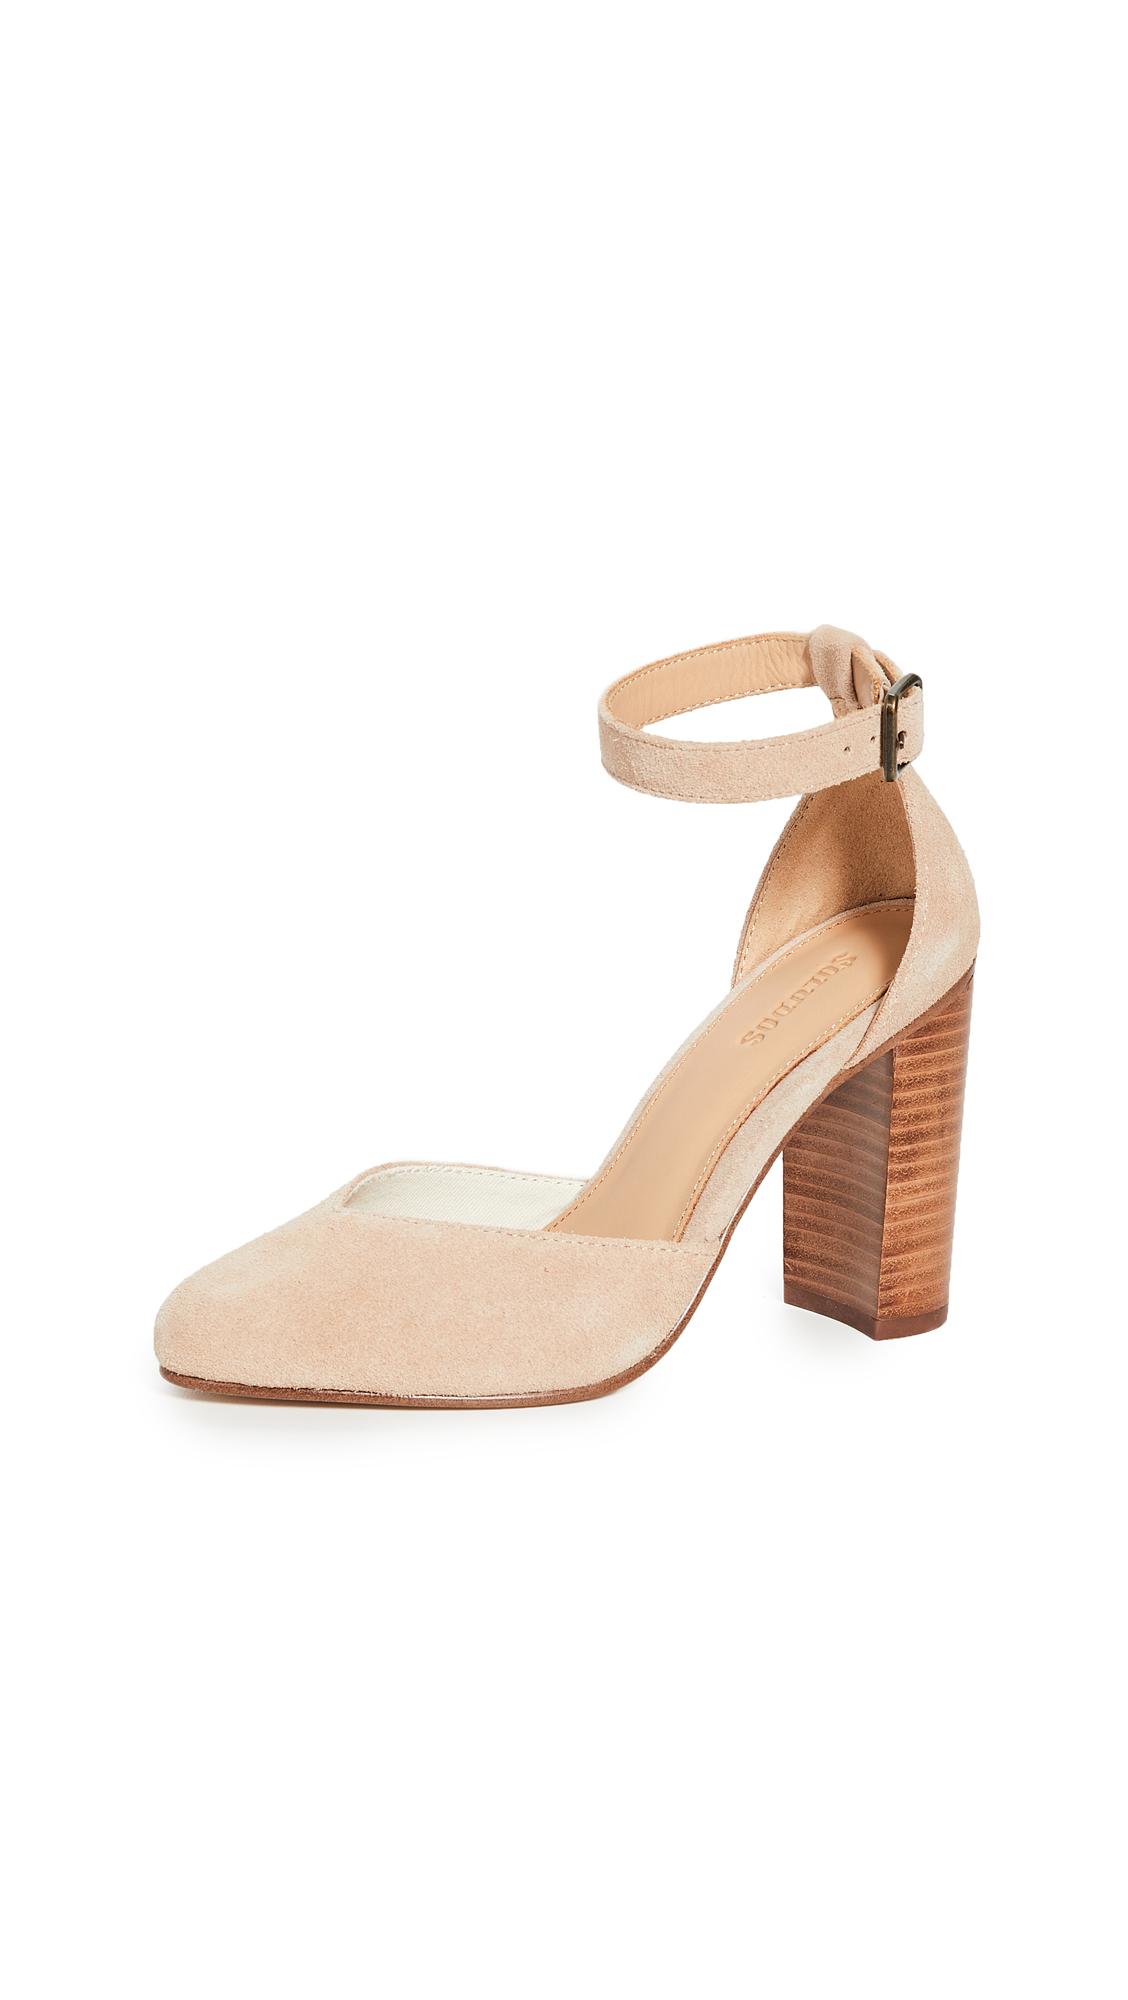 Soludos Collette Block Heel Sandals